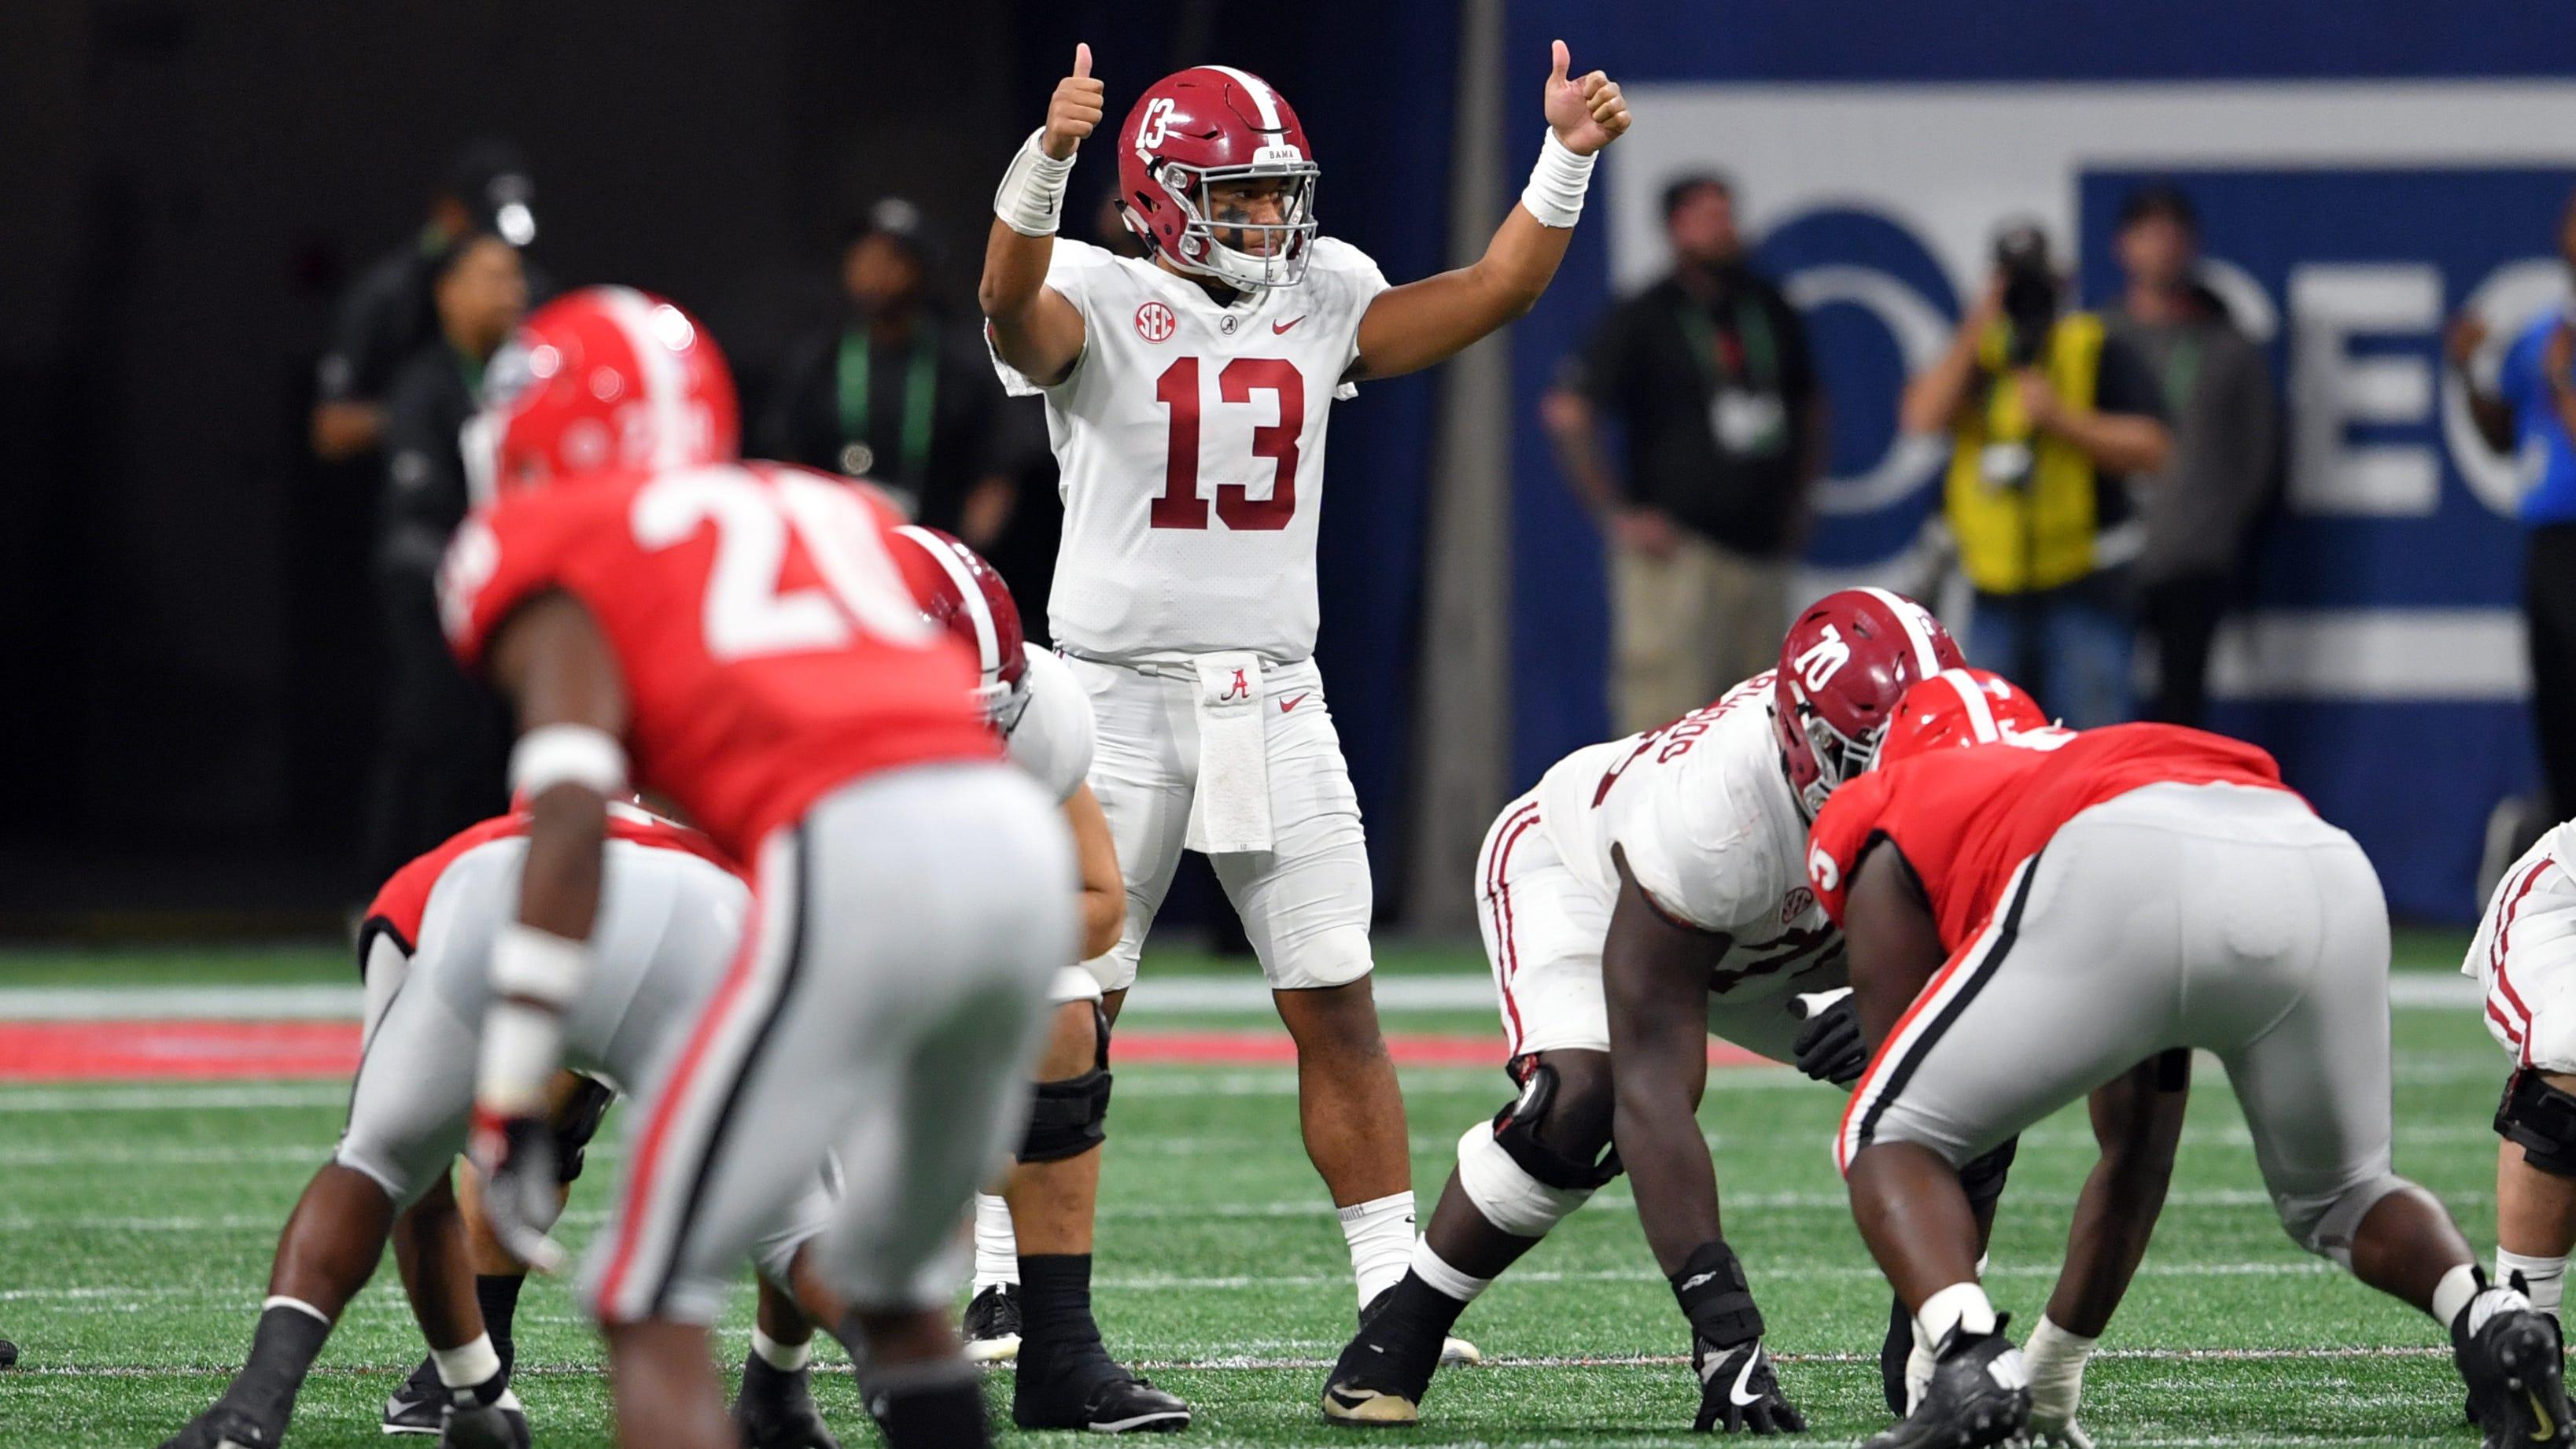 College Football Alabama Clemson Lead Top 25 Teams For 2019 Season